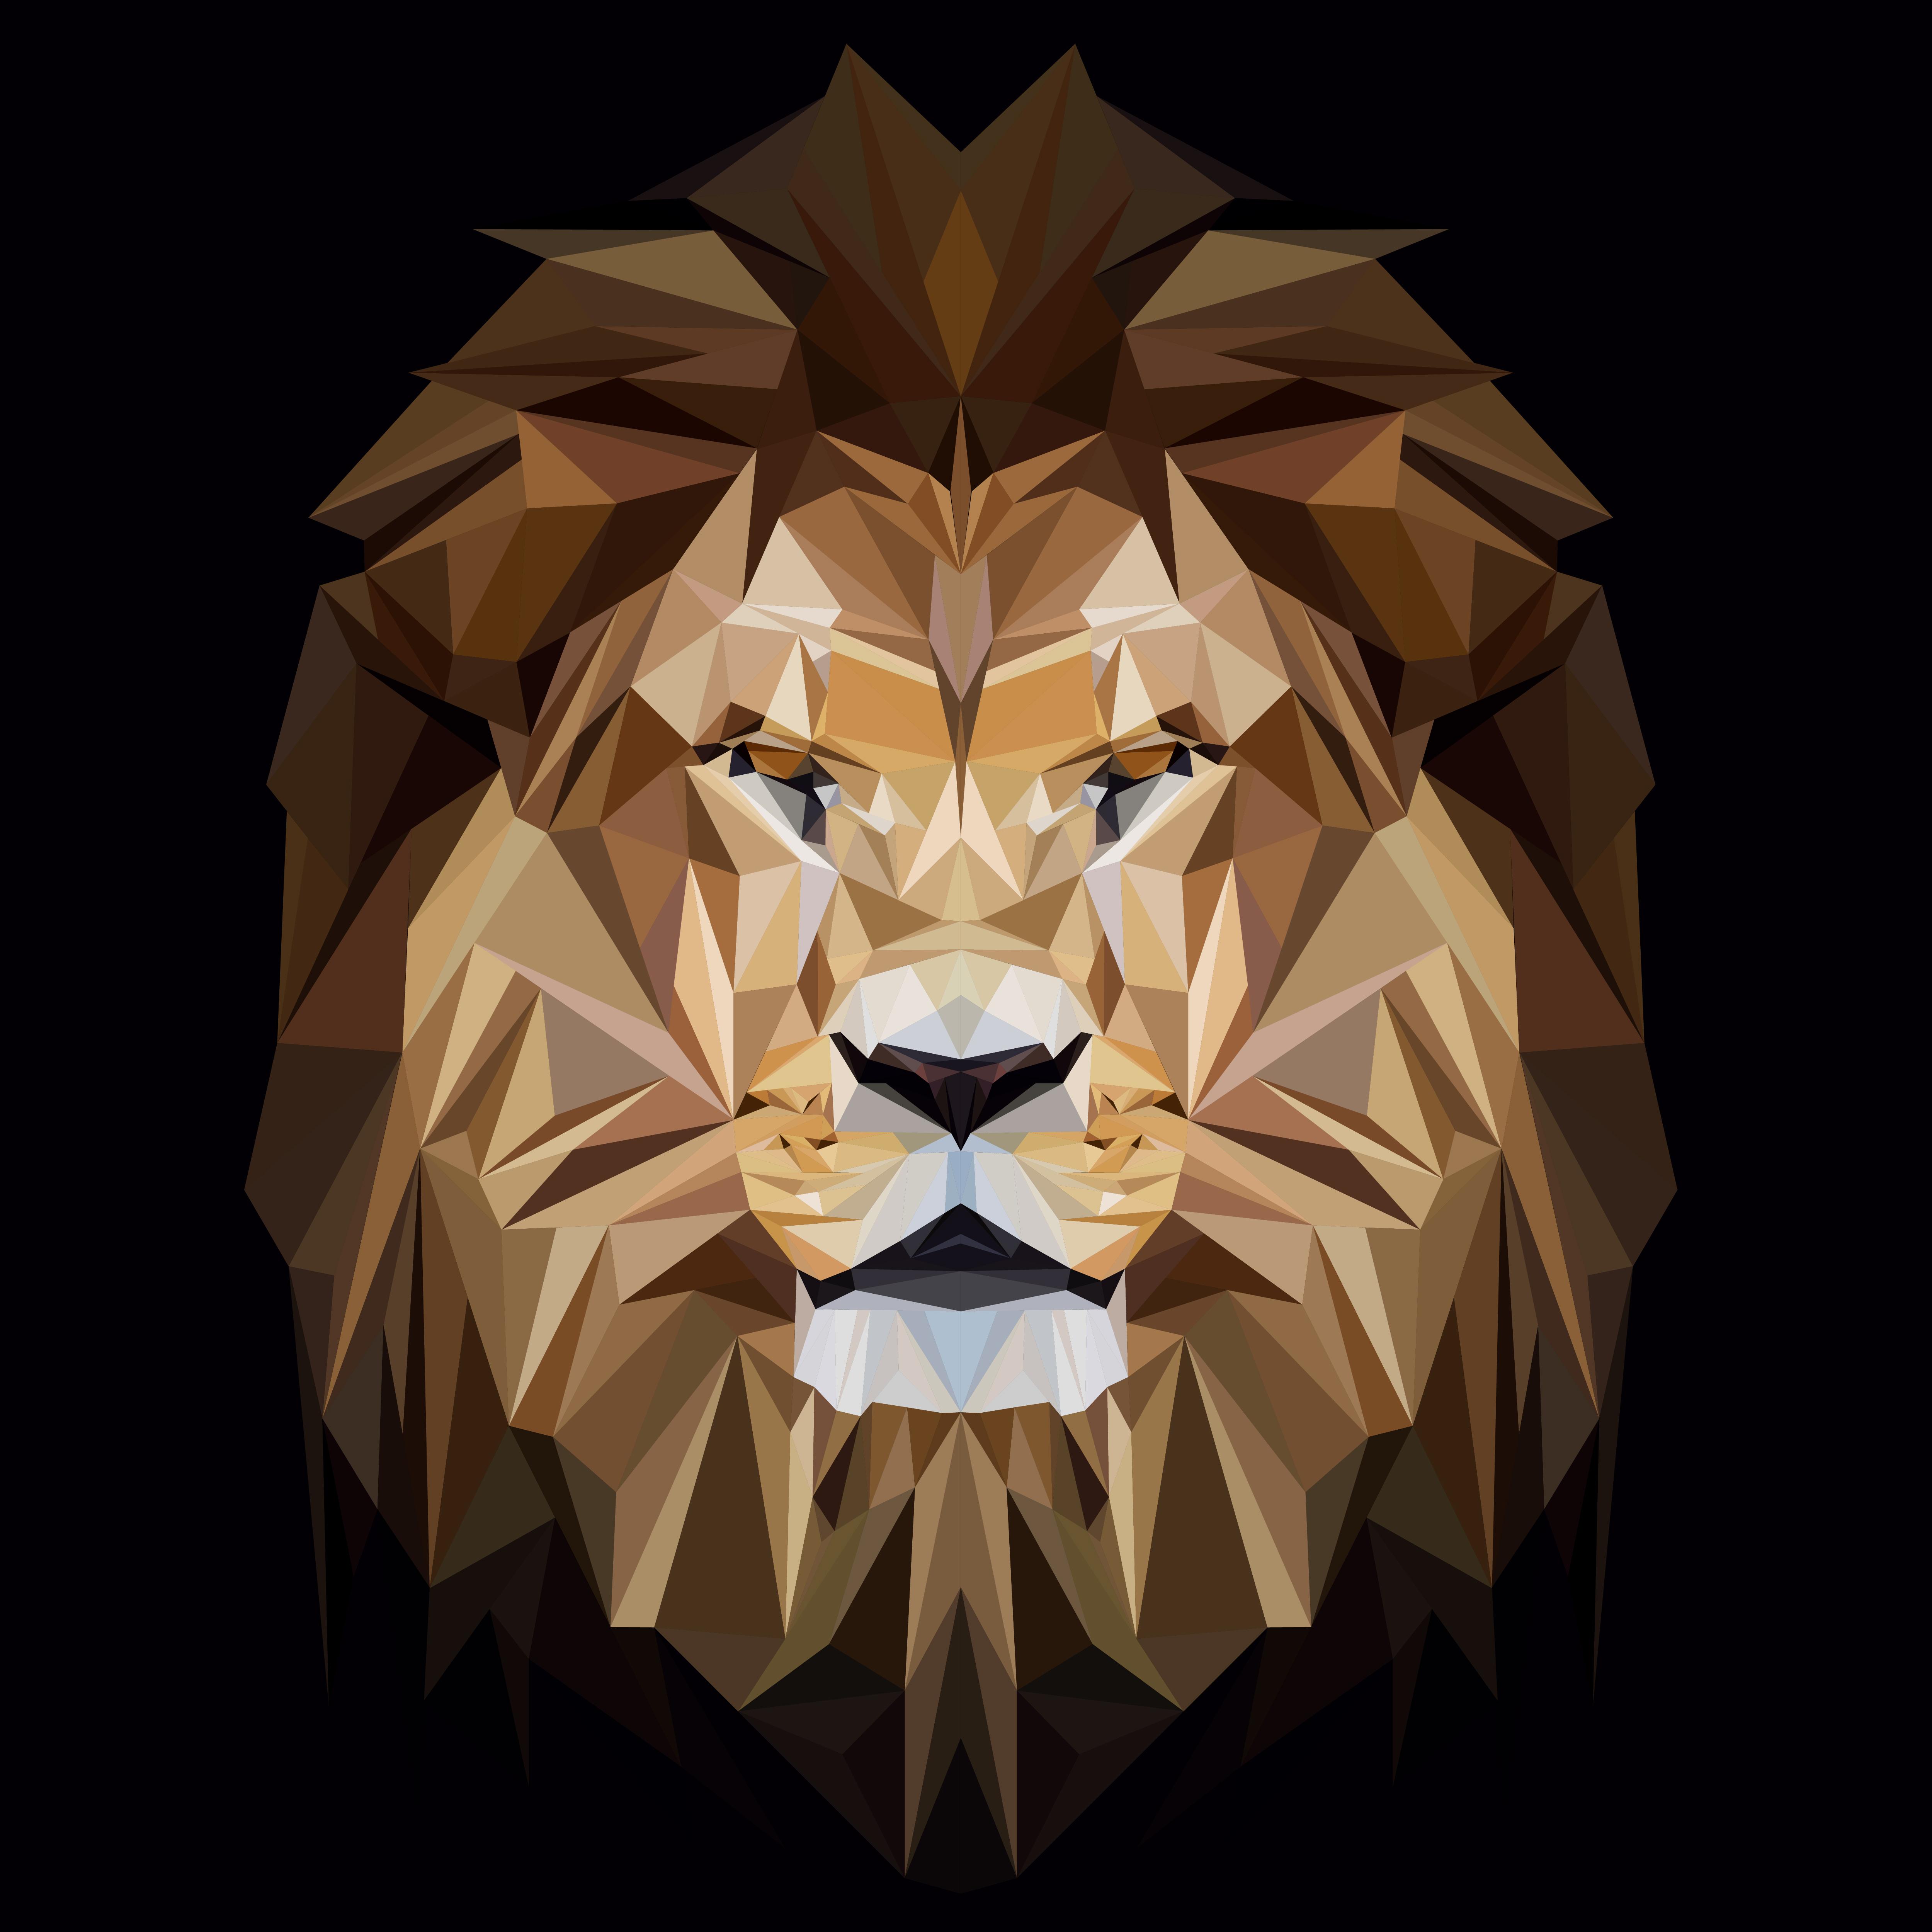 Amar A Muerte Capitulo 12: Comienza A Regir El Signo De Leo: Un Segundo Semestre Del